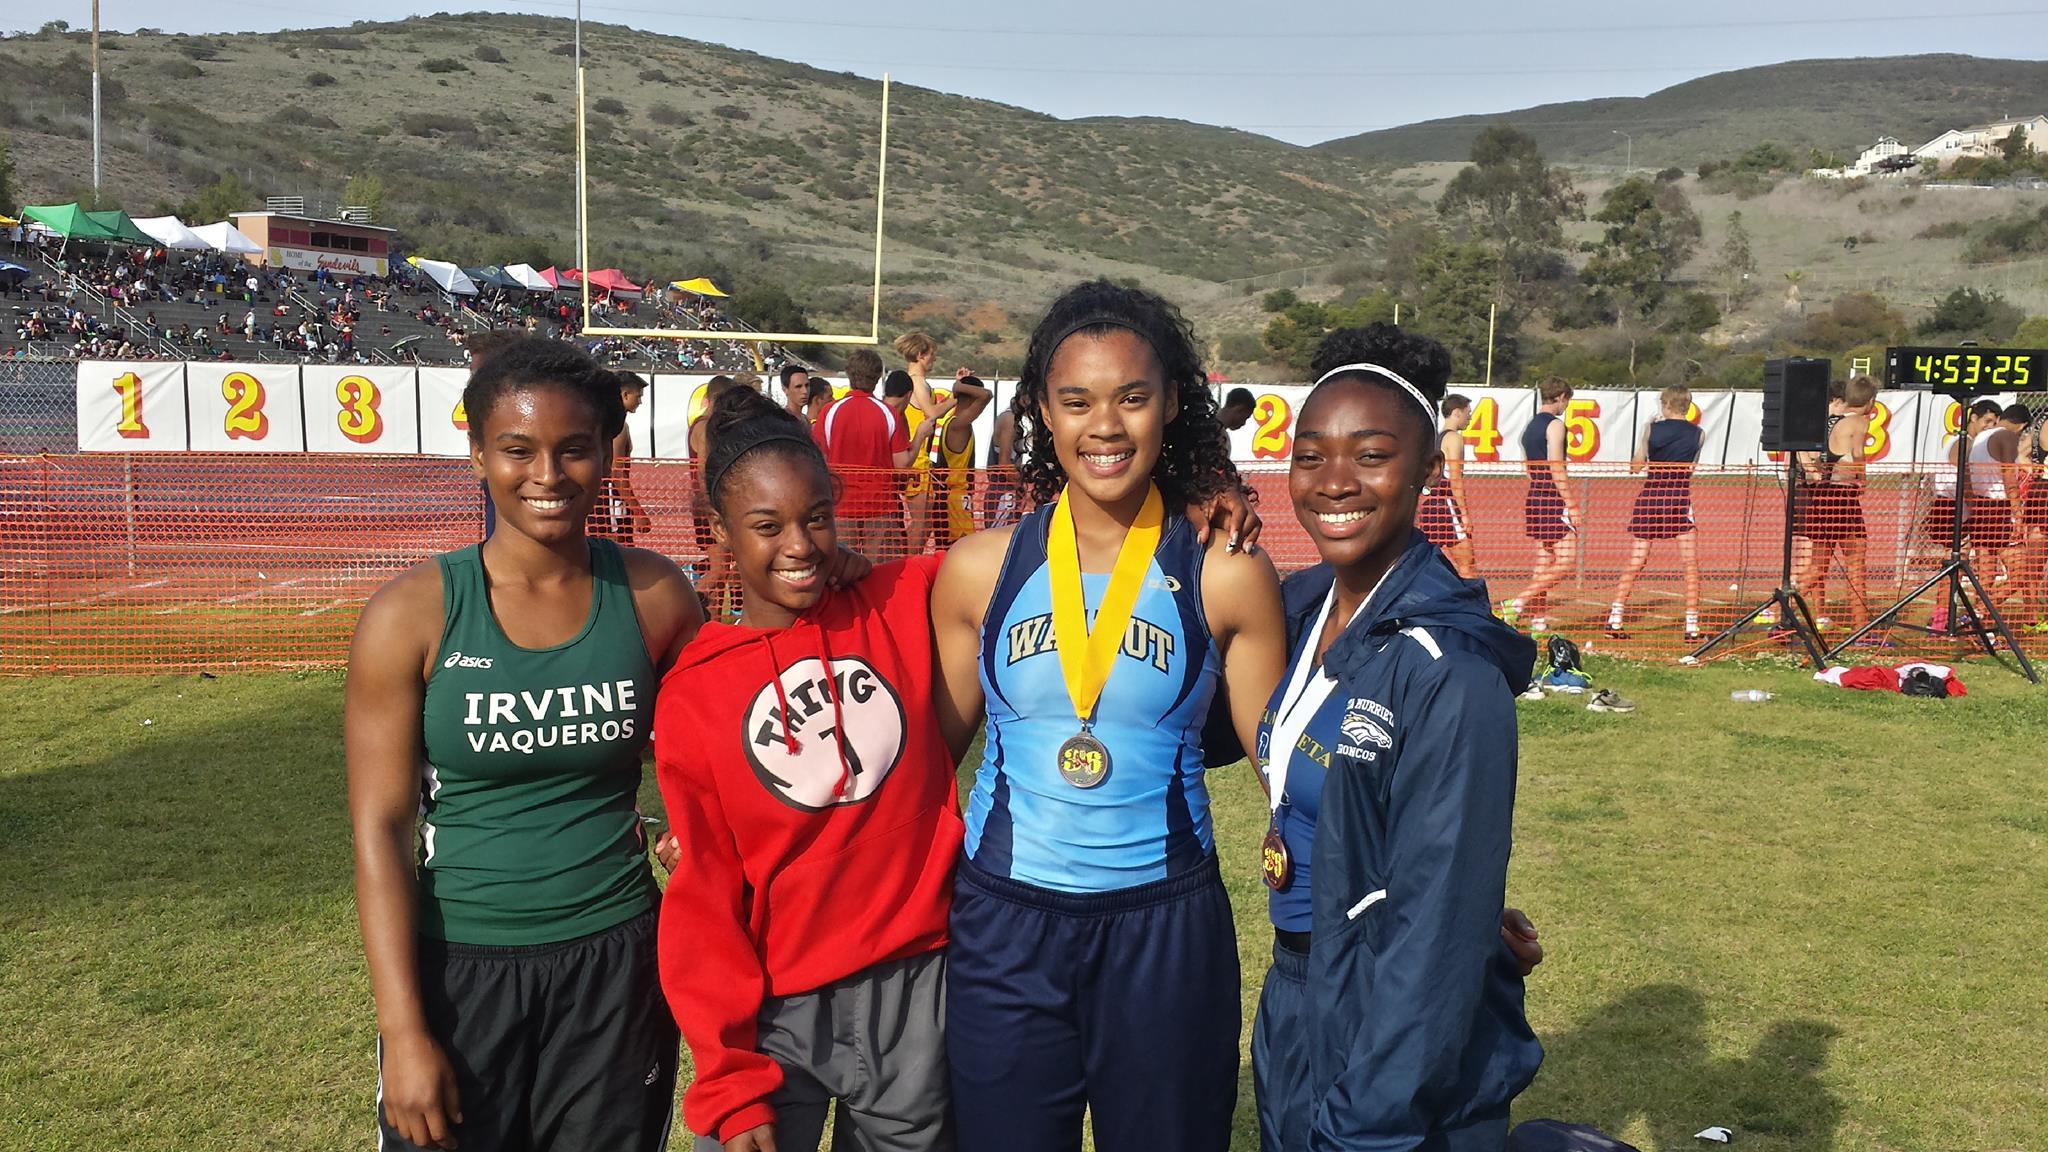 Kayla Richardson with medal around neck and team mates.